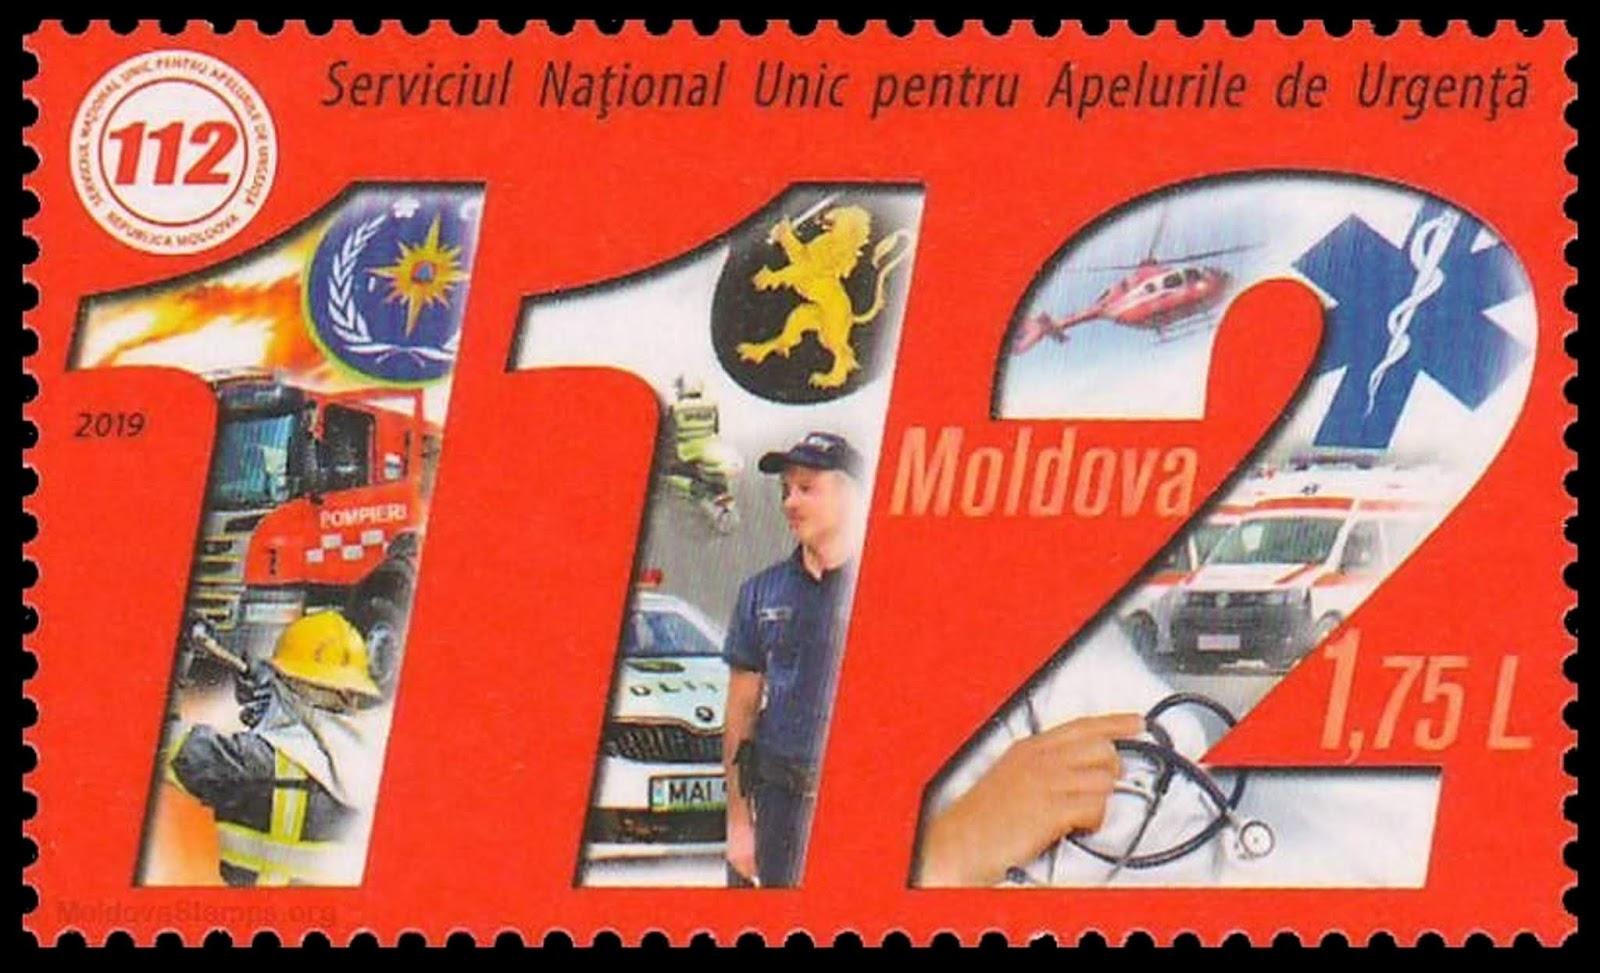 Moldova - National Emergency Service (January 3, 2019)